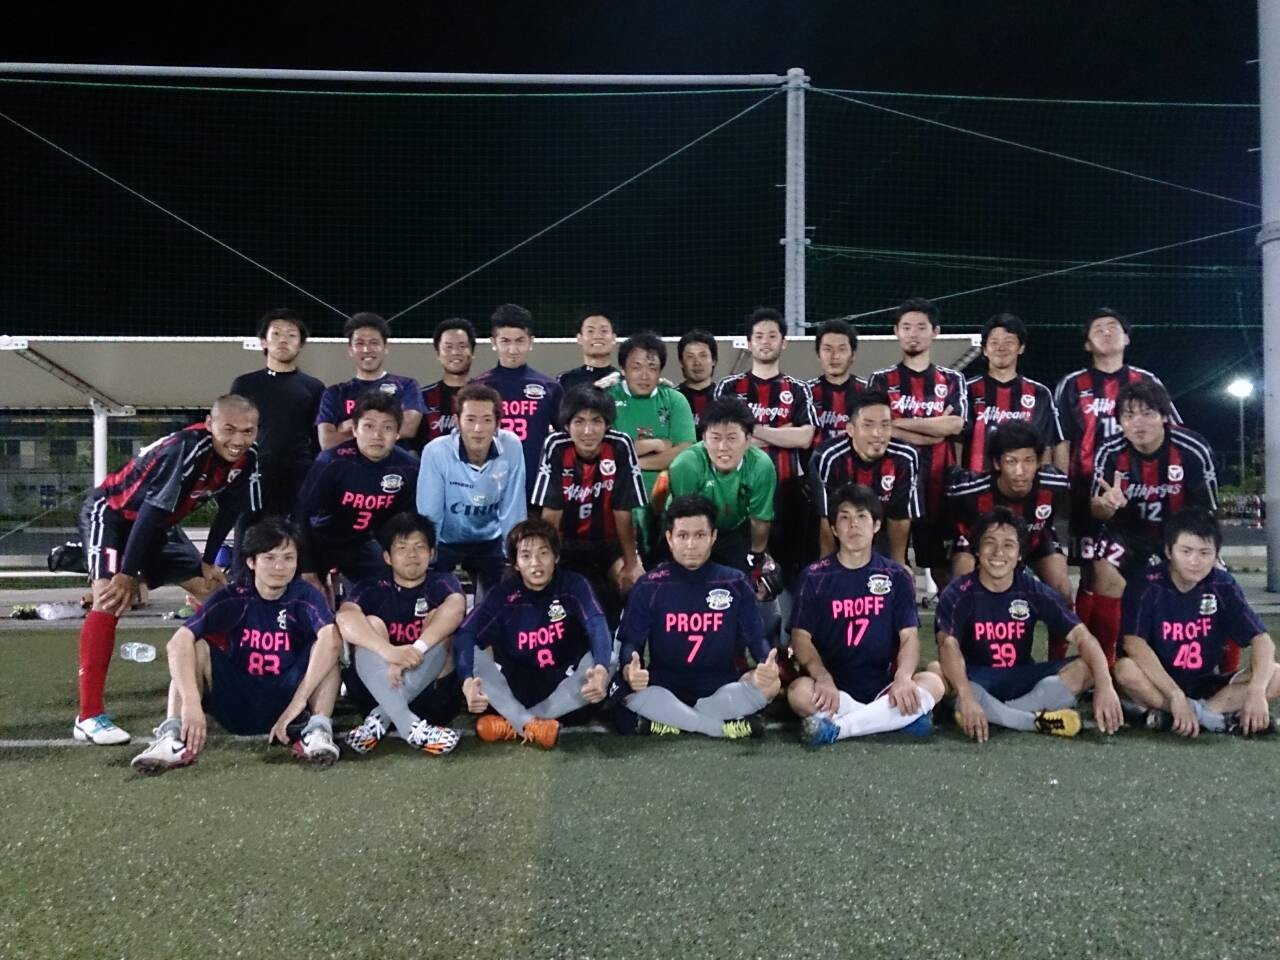 2014/6/8 J-GREEN堺S6 vs TEITSU FC vs アスペガス生駒 アスペガスさんと集合写真